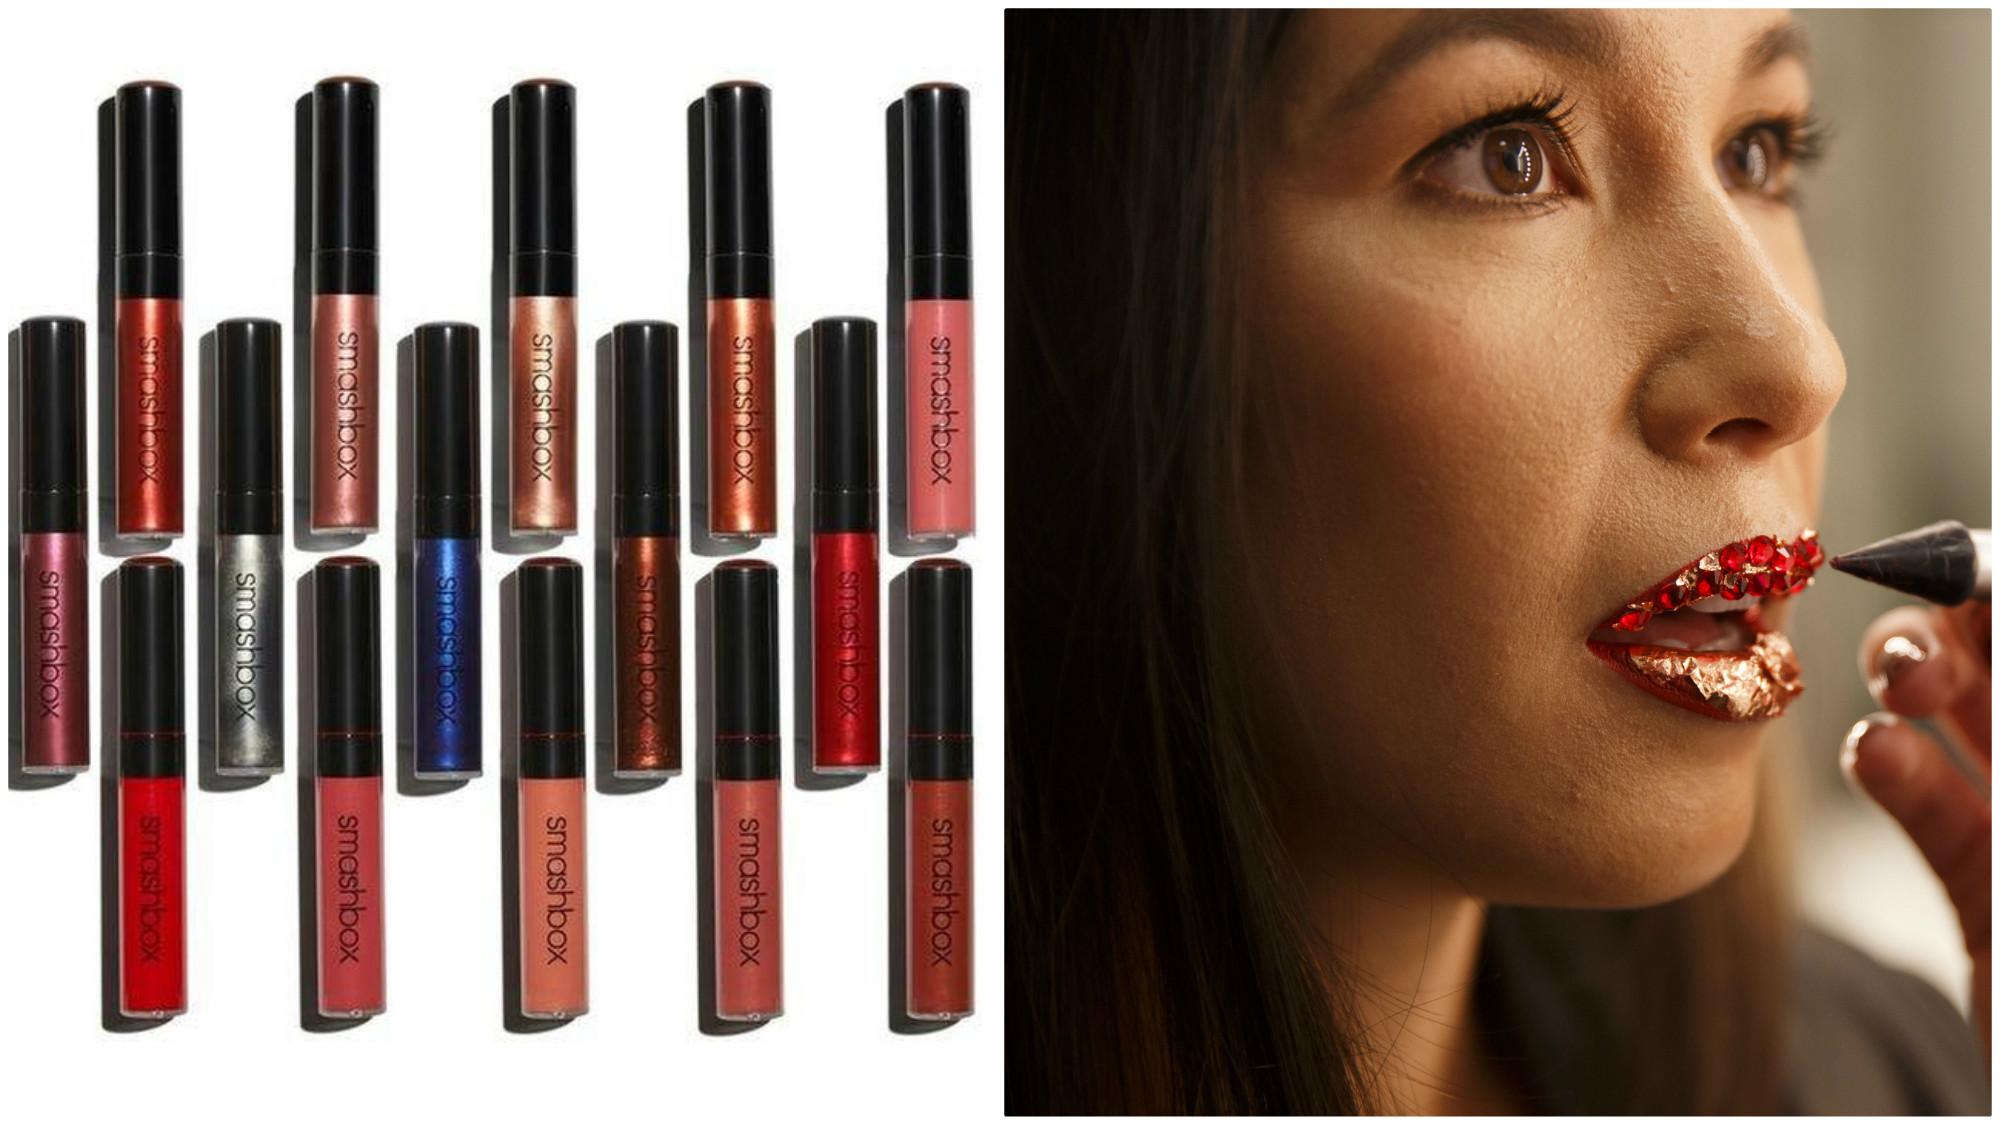 Meet Makeup Artist Vlada Haggerty Smashbox Cosmeticsu0026#39; New U0026#39;lip Editor In Chiefu0026#39;